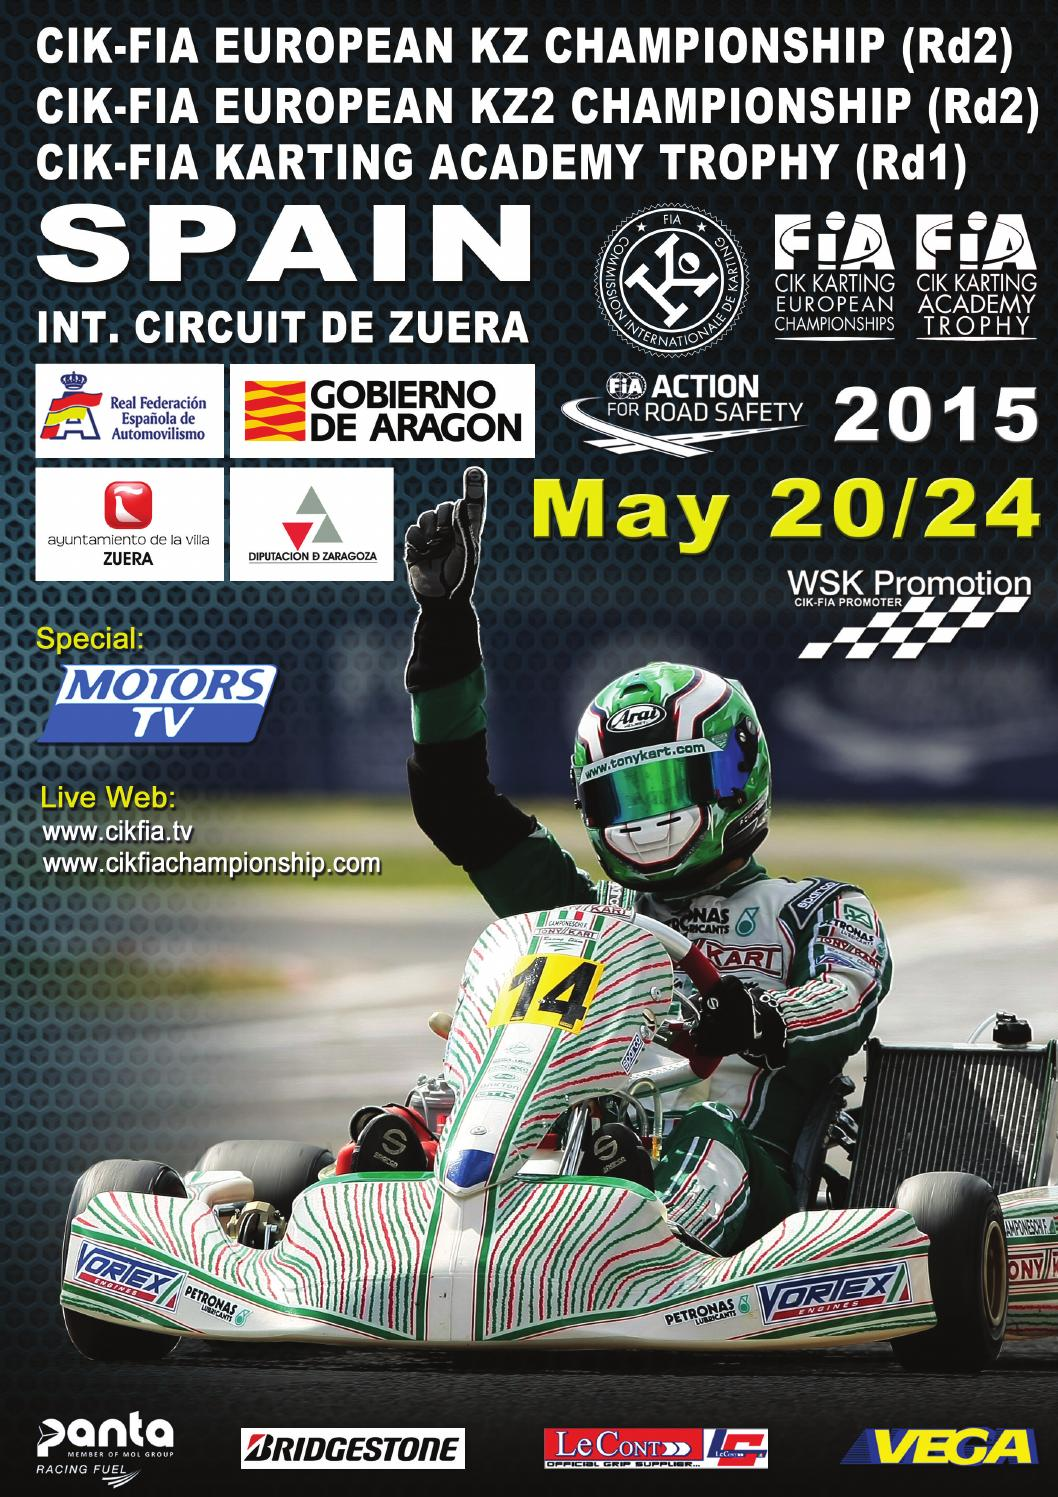 Circuito Zuera : Cik fia european championship 2015 zuera by wsk promotion issuu